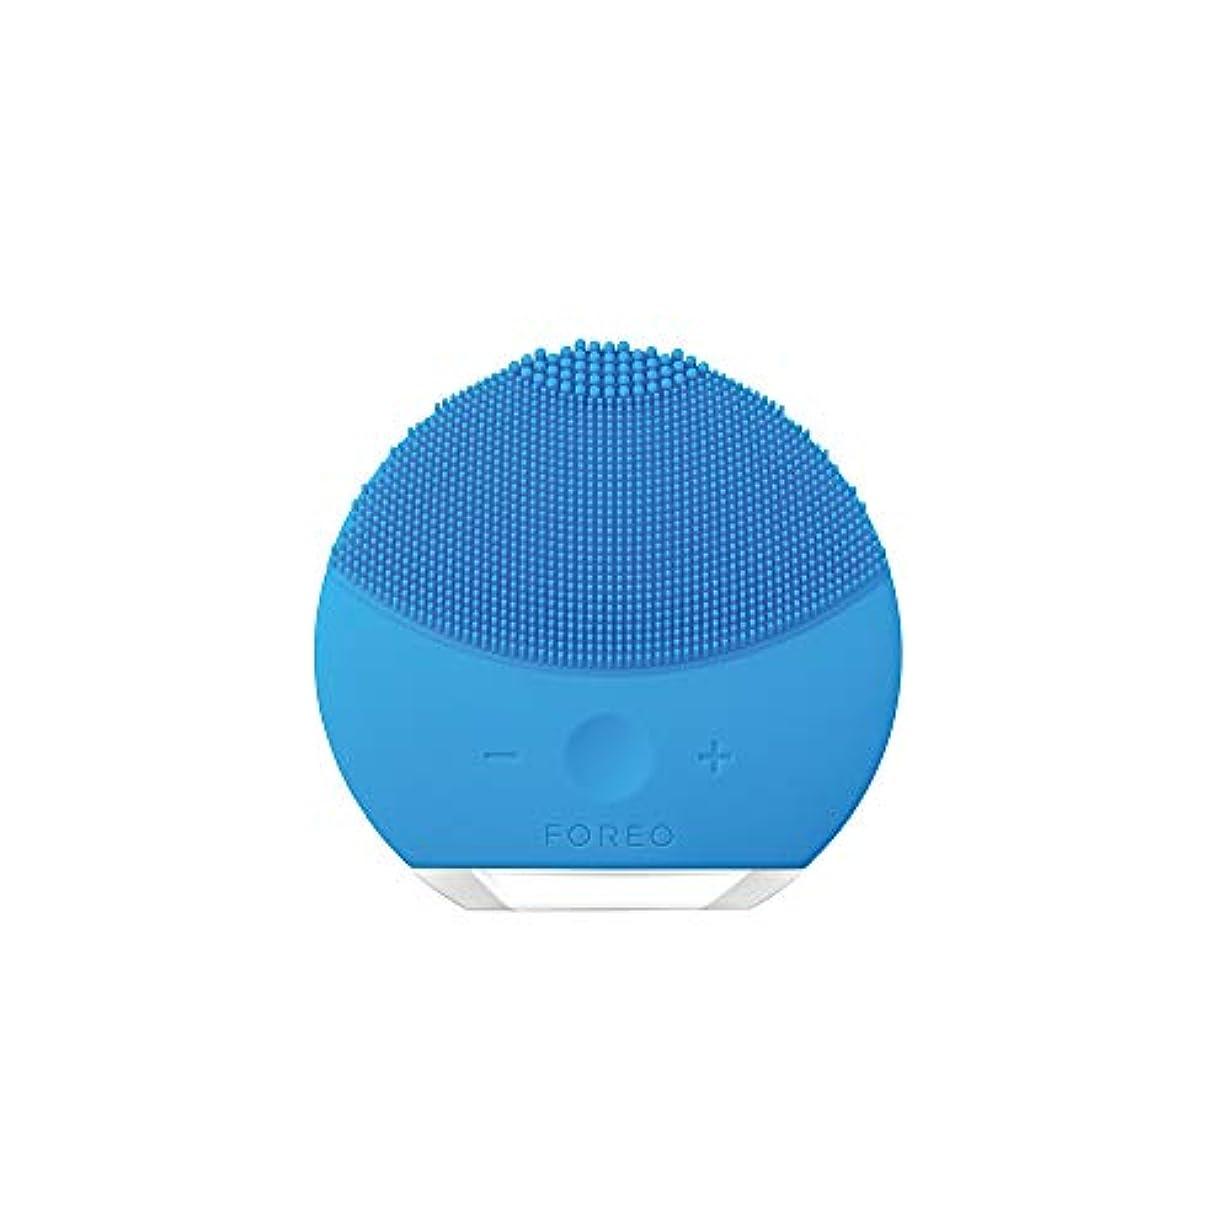 FOREO LUNA mini 2 アクアマリン 電動洗顔ブラシ シリコーン製 音波振動